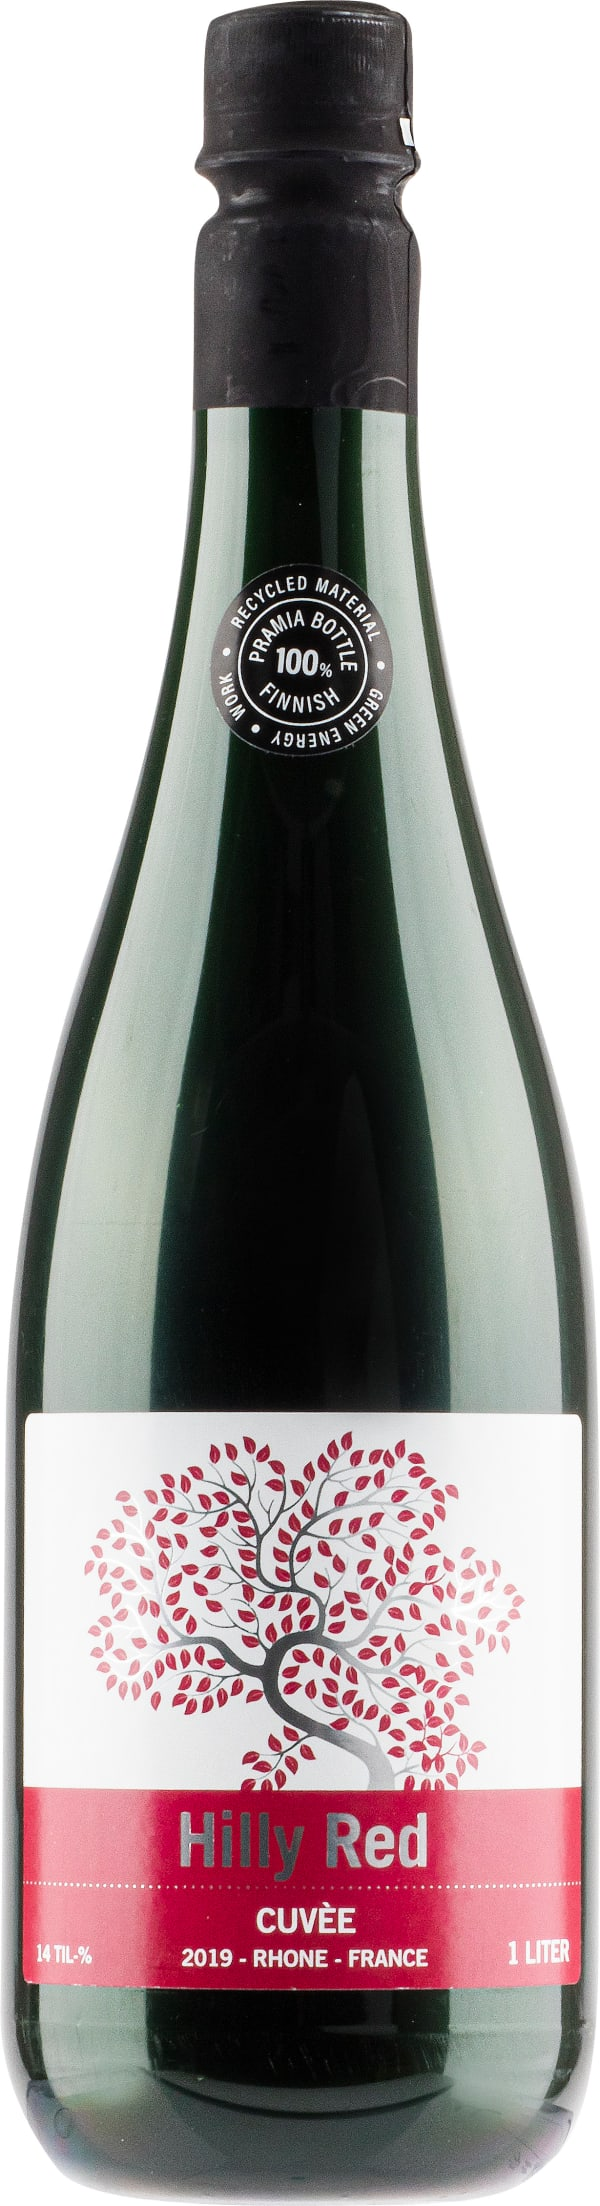 Hilly Red Cuvée 2019 plastic bottle